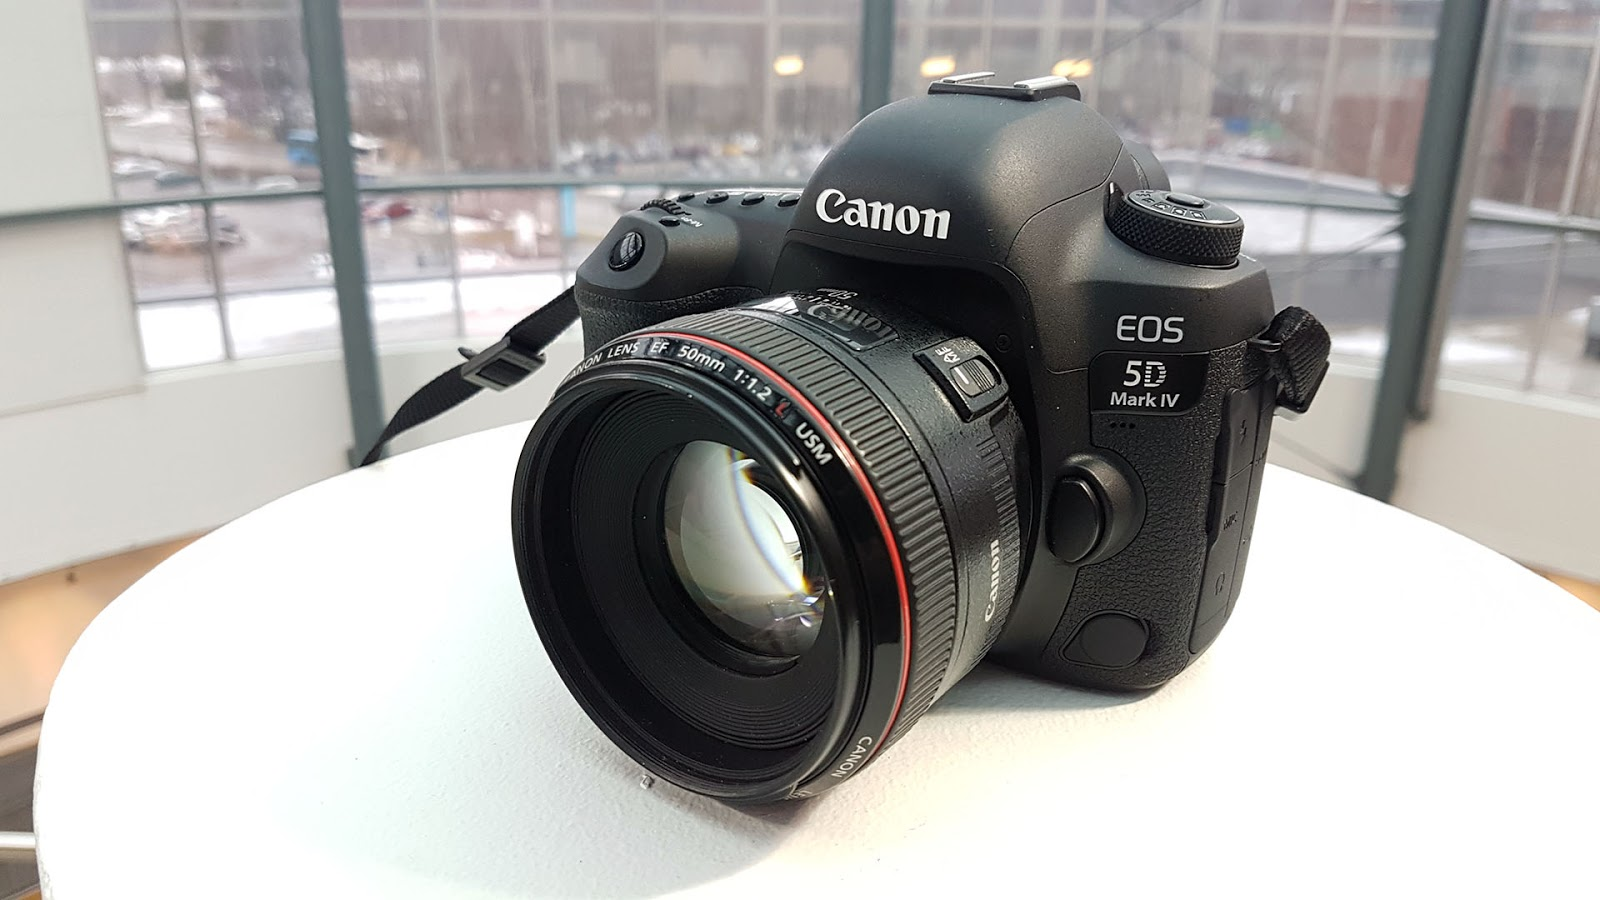 Bittimittari havaintoja canon 5dm4 kamerasta for Canon 5dm4